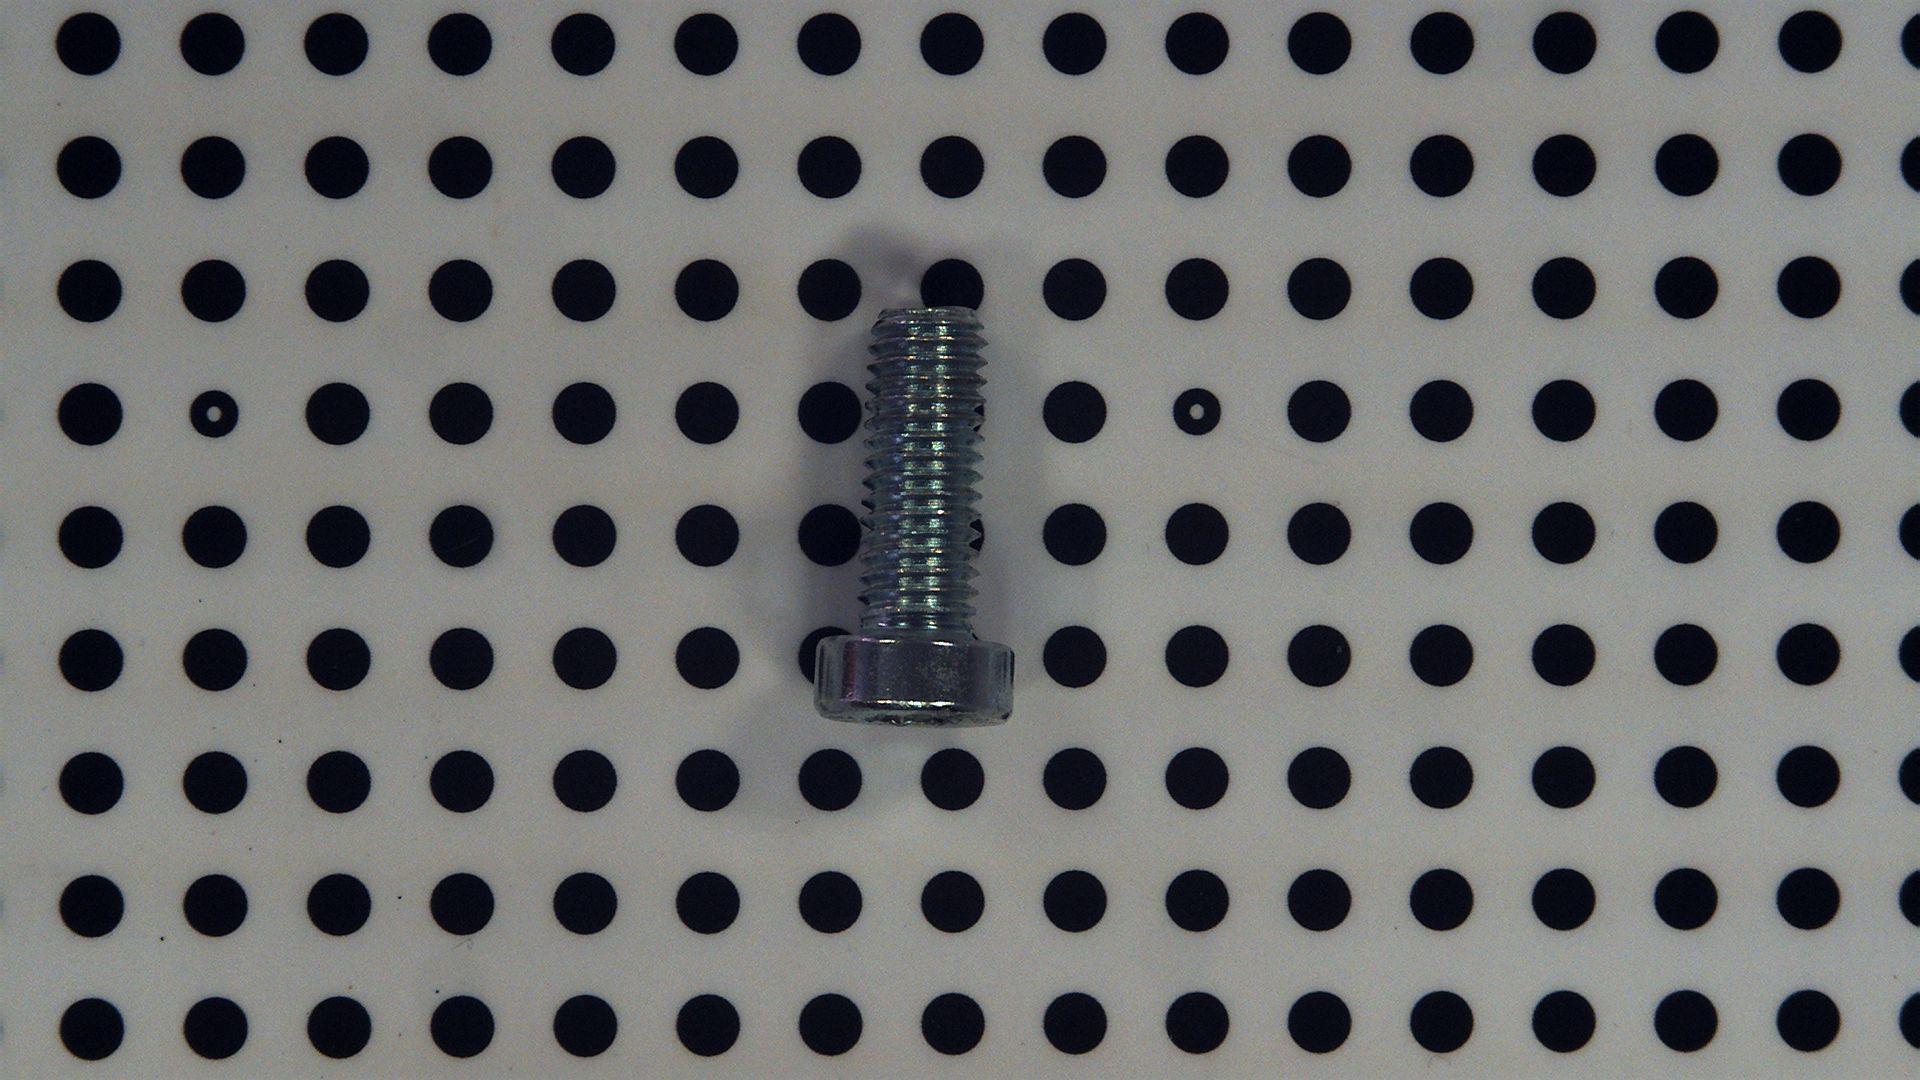 dfk-afux236-m12-svl-2540smac-586mm.jpg